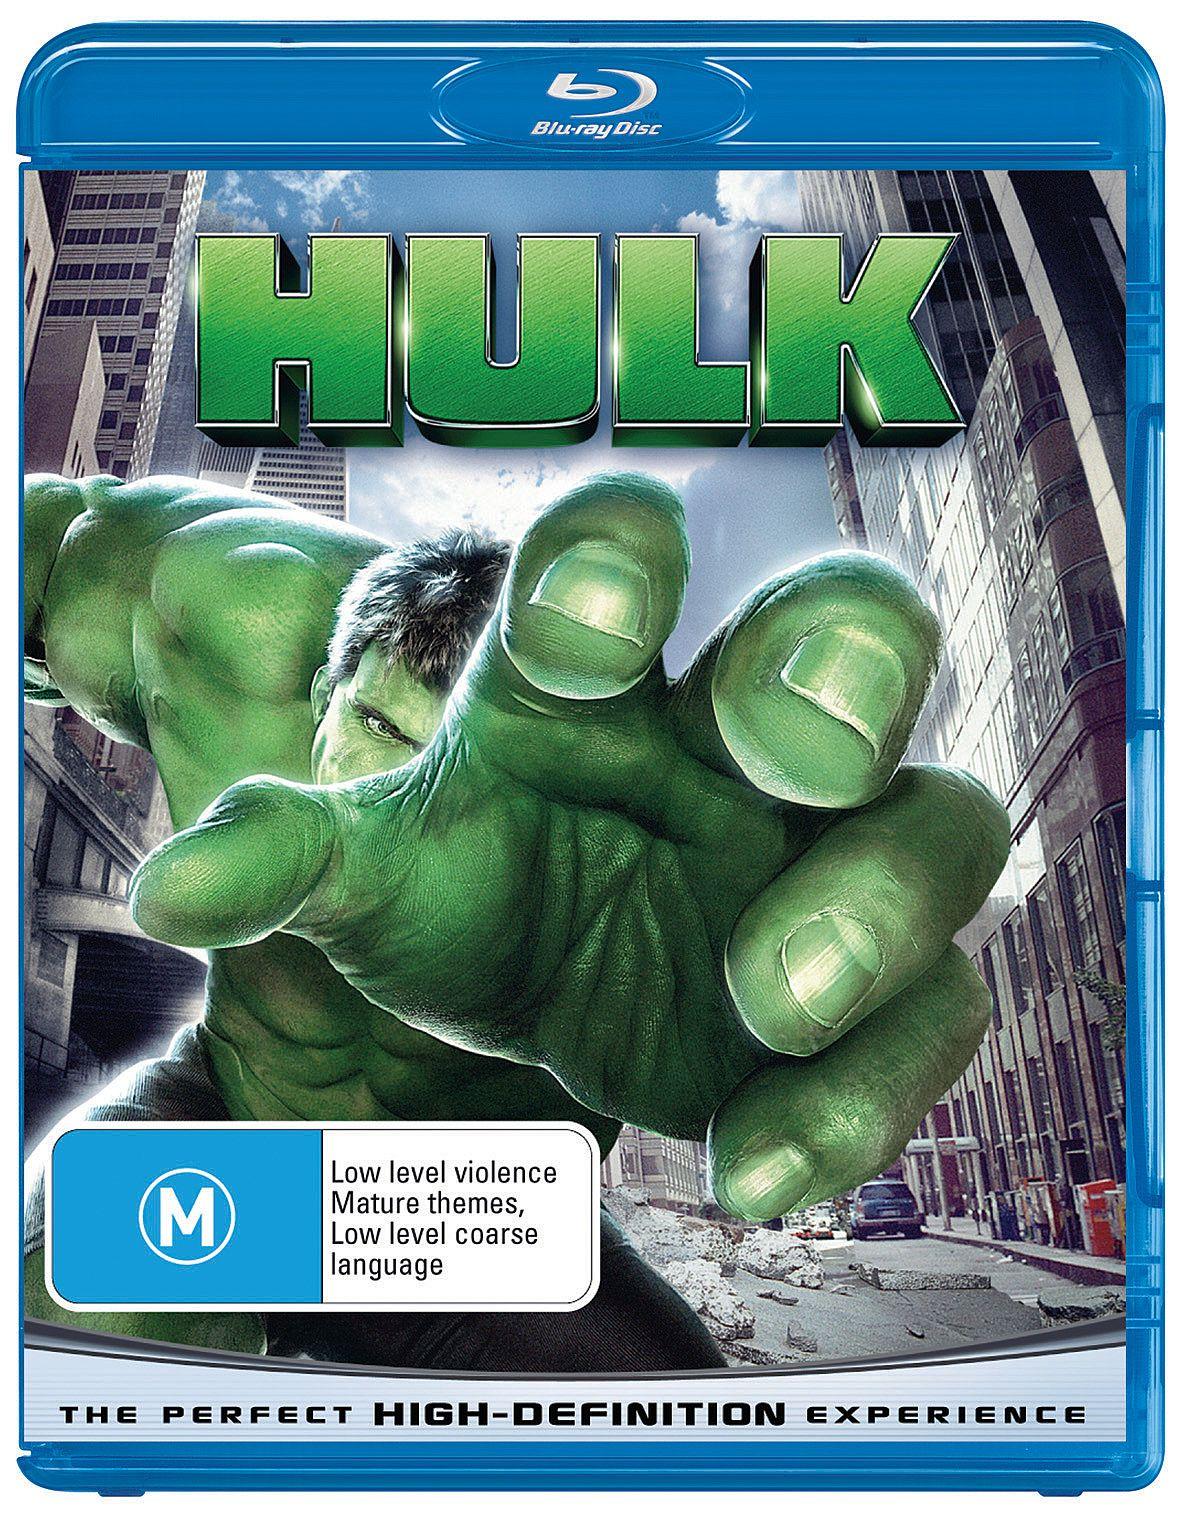 my wonderful wife found me the hulk mickey ear as